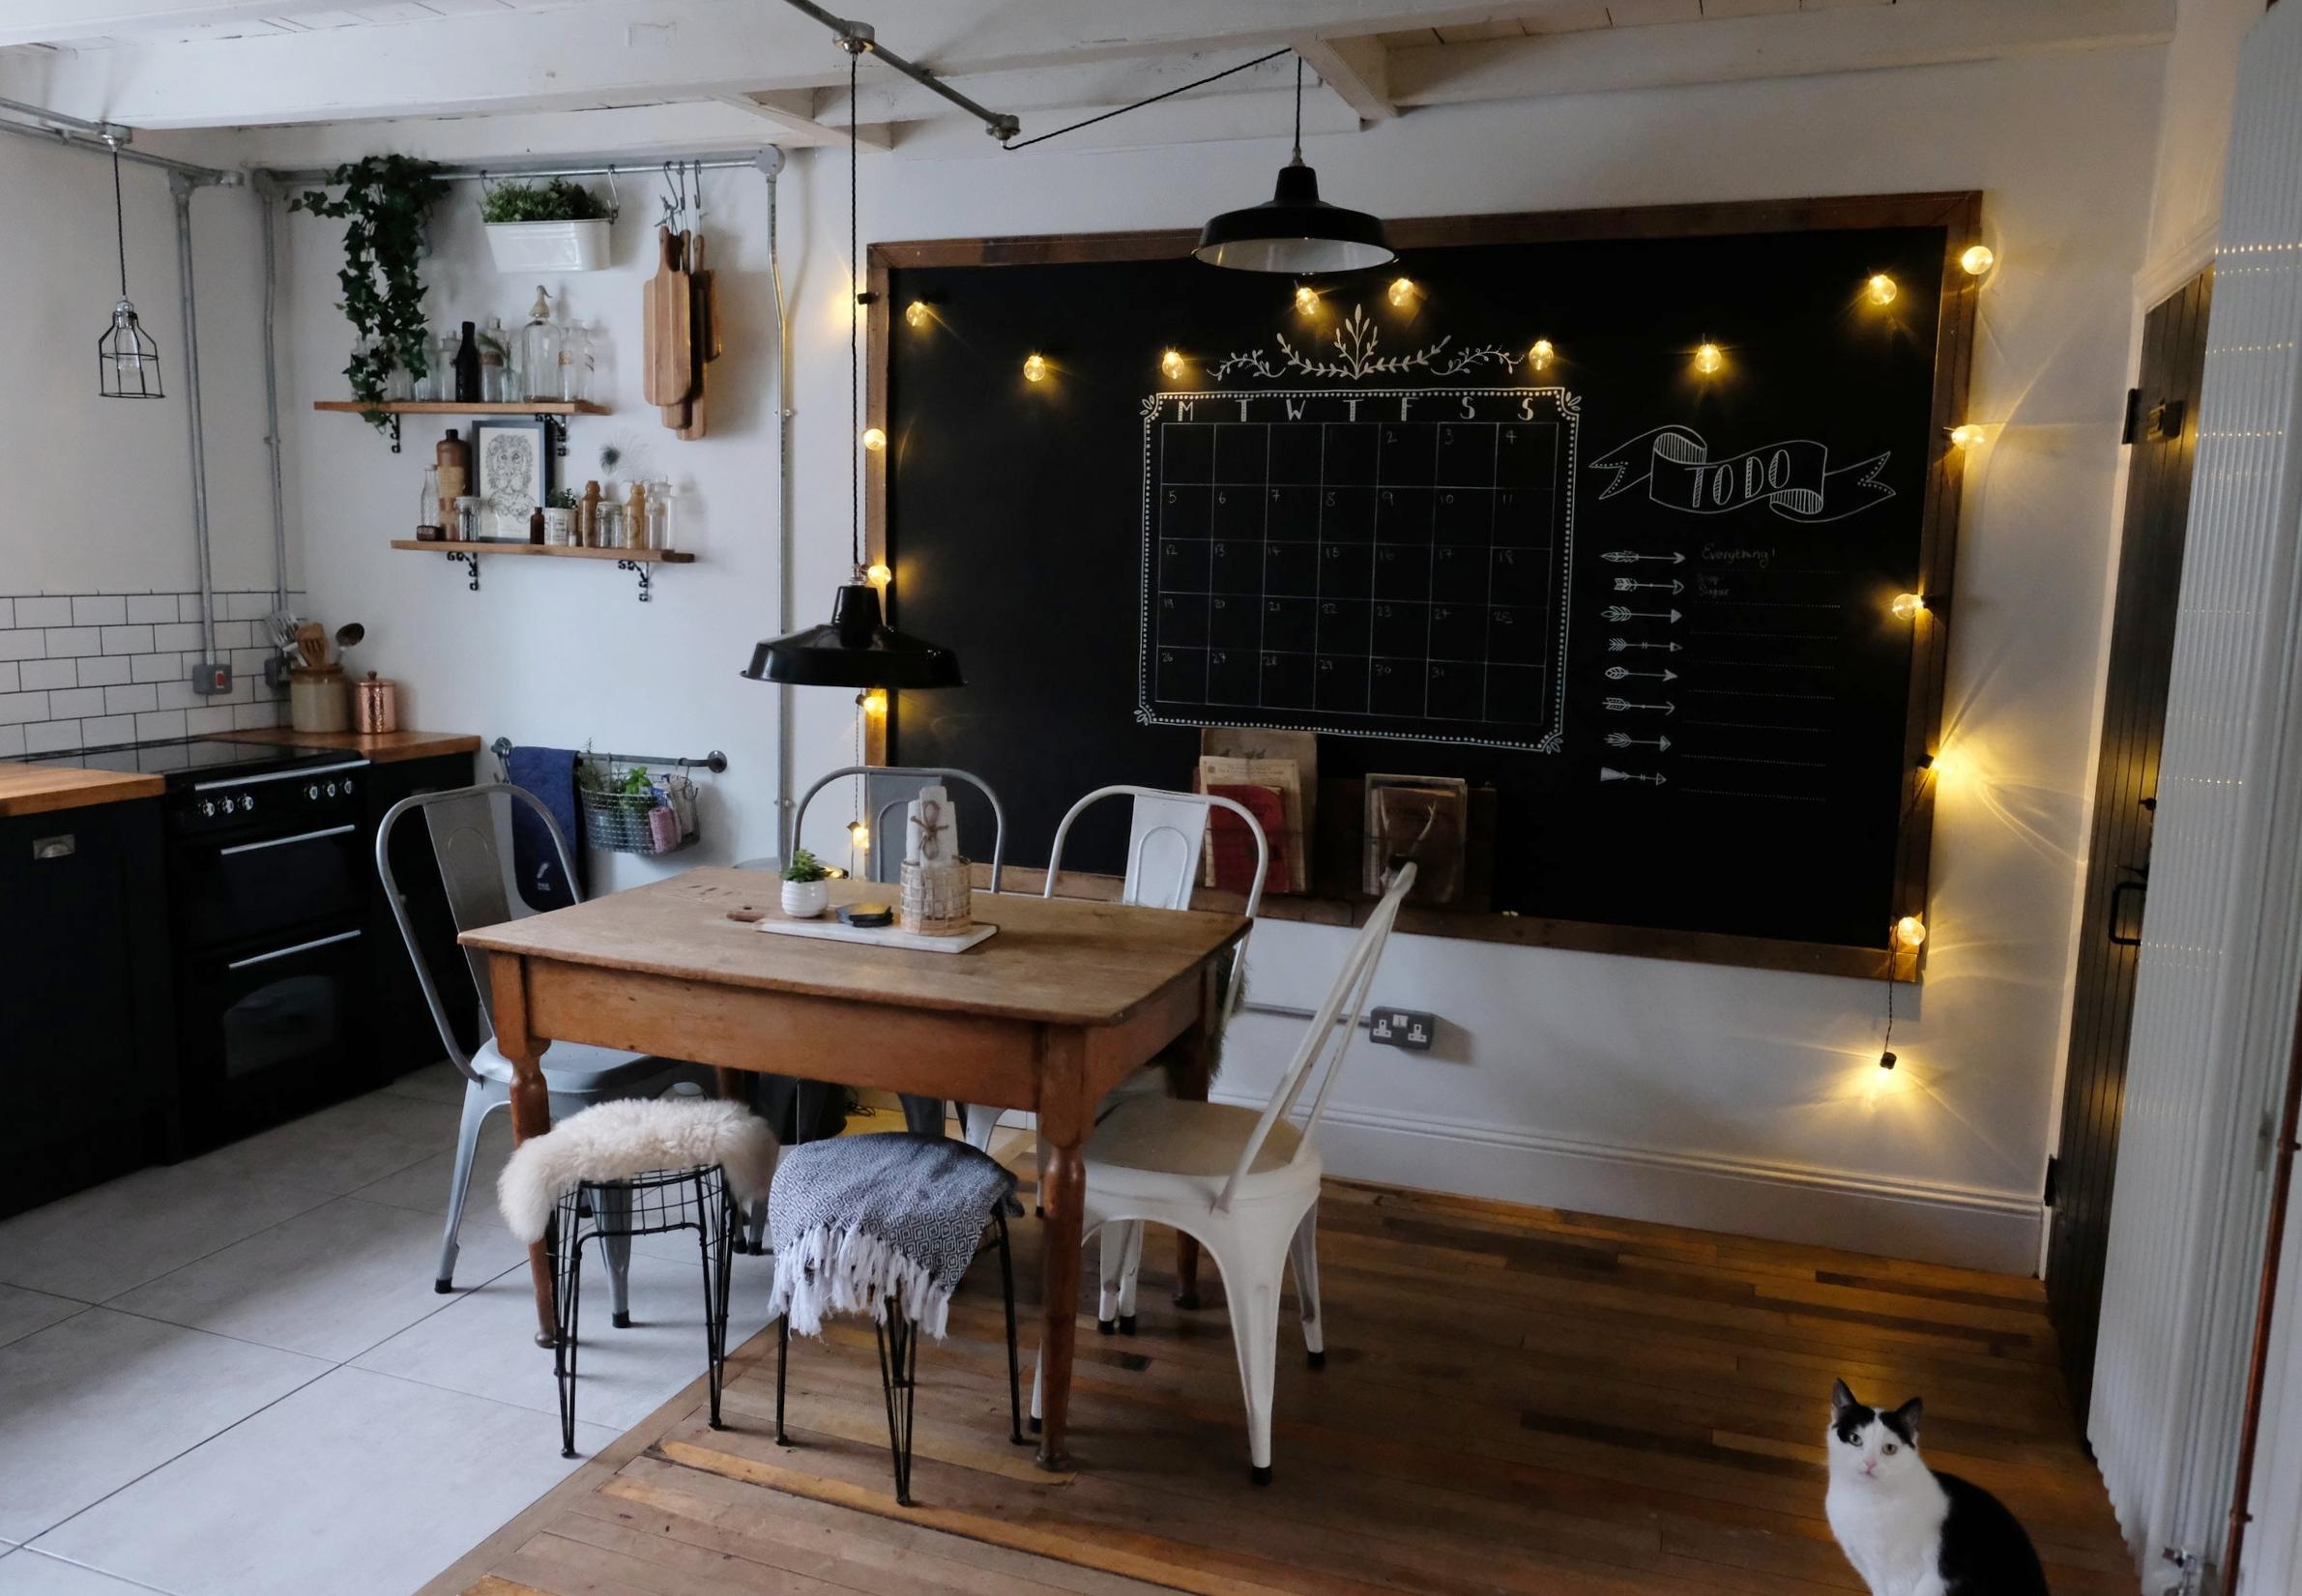 renovation kitchen inspiration interior blogger